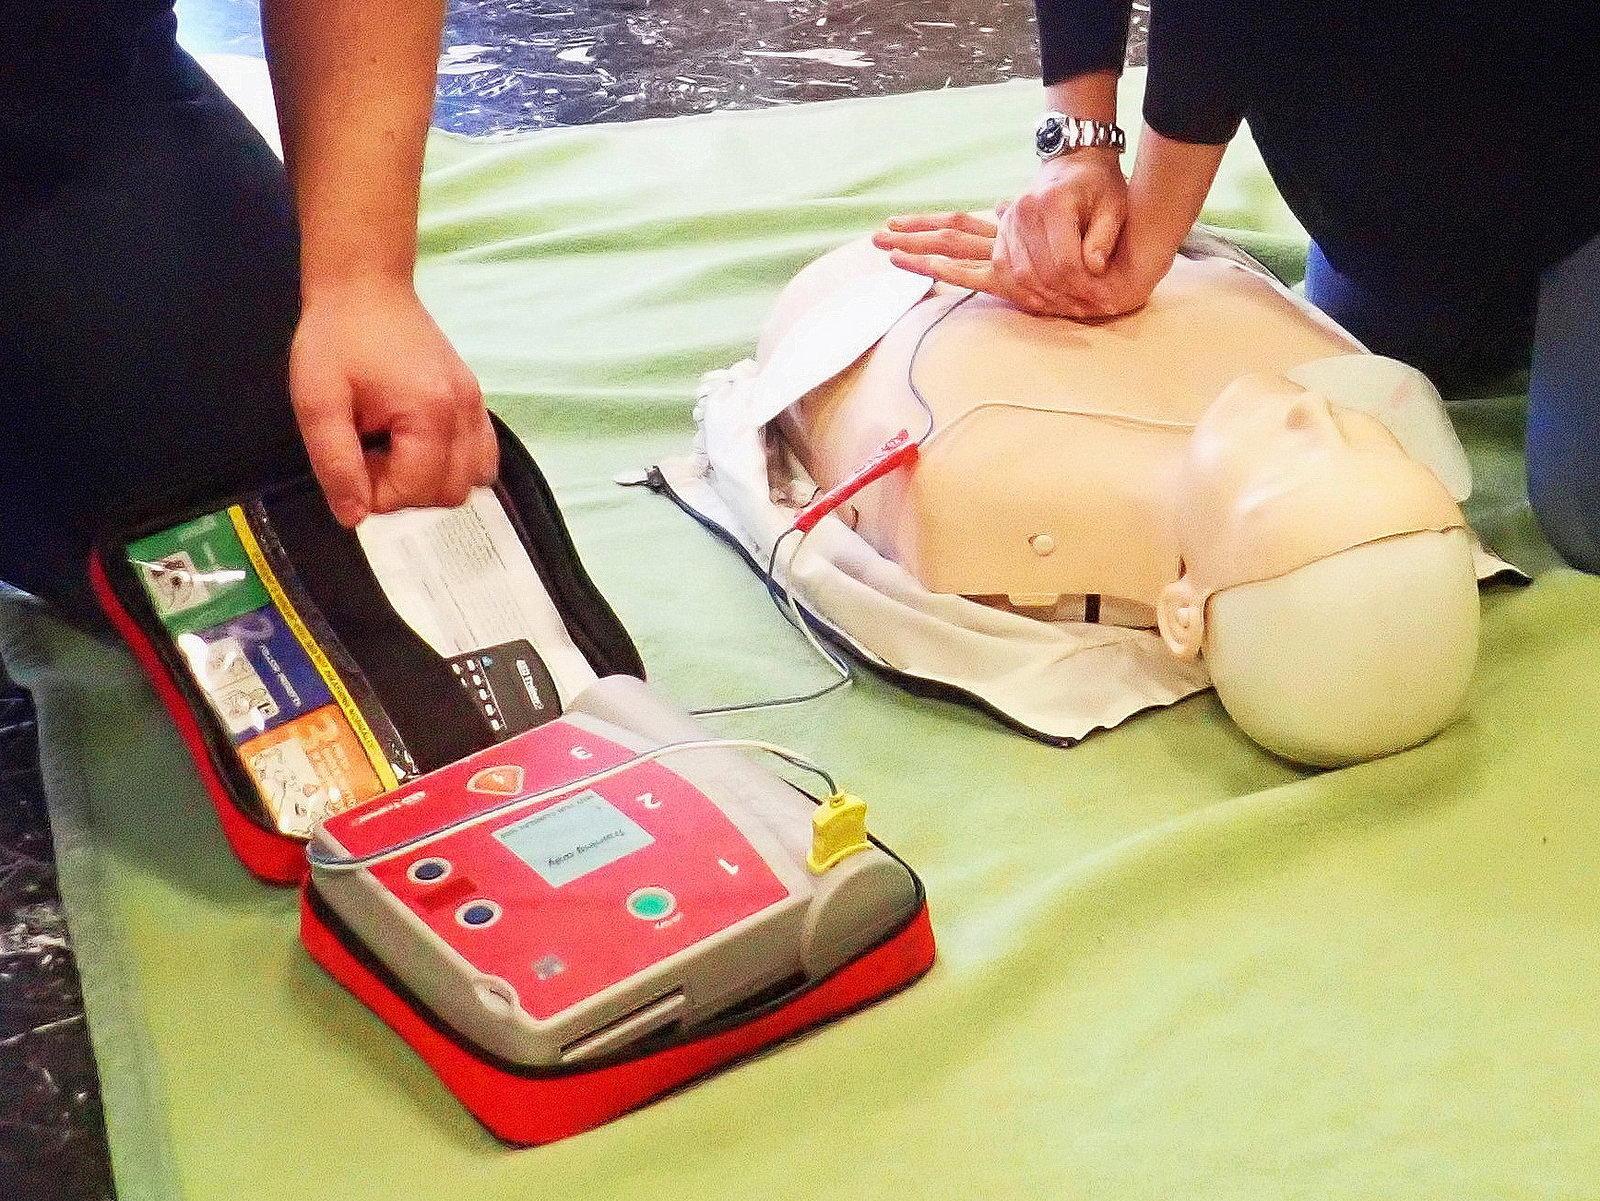 Training am Defibrilator